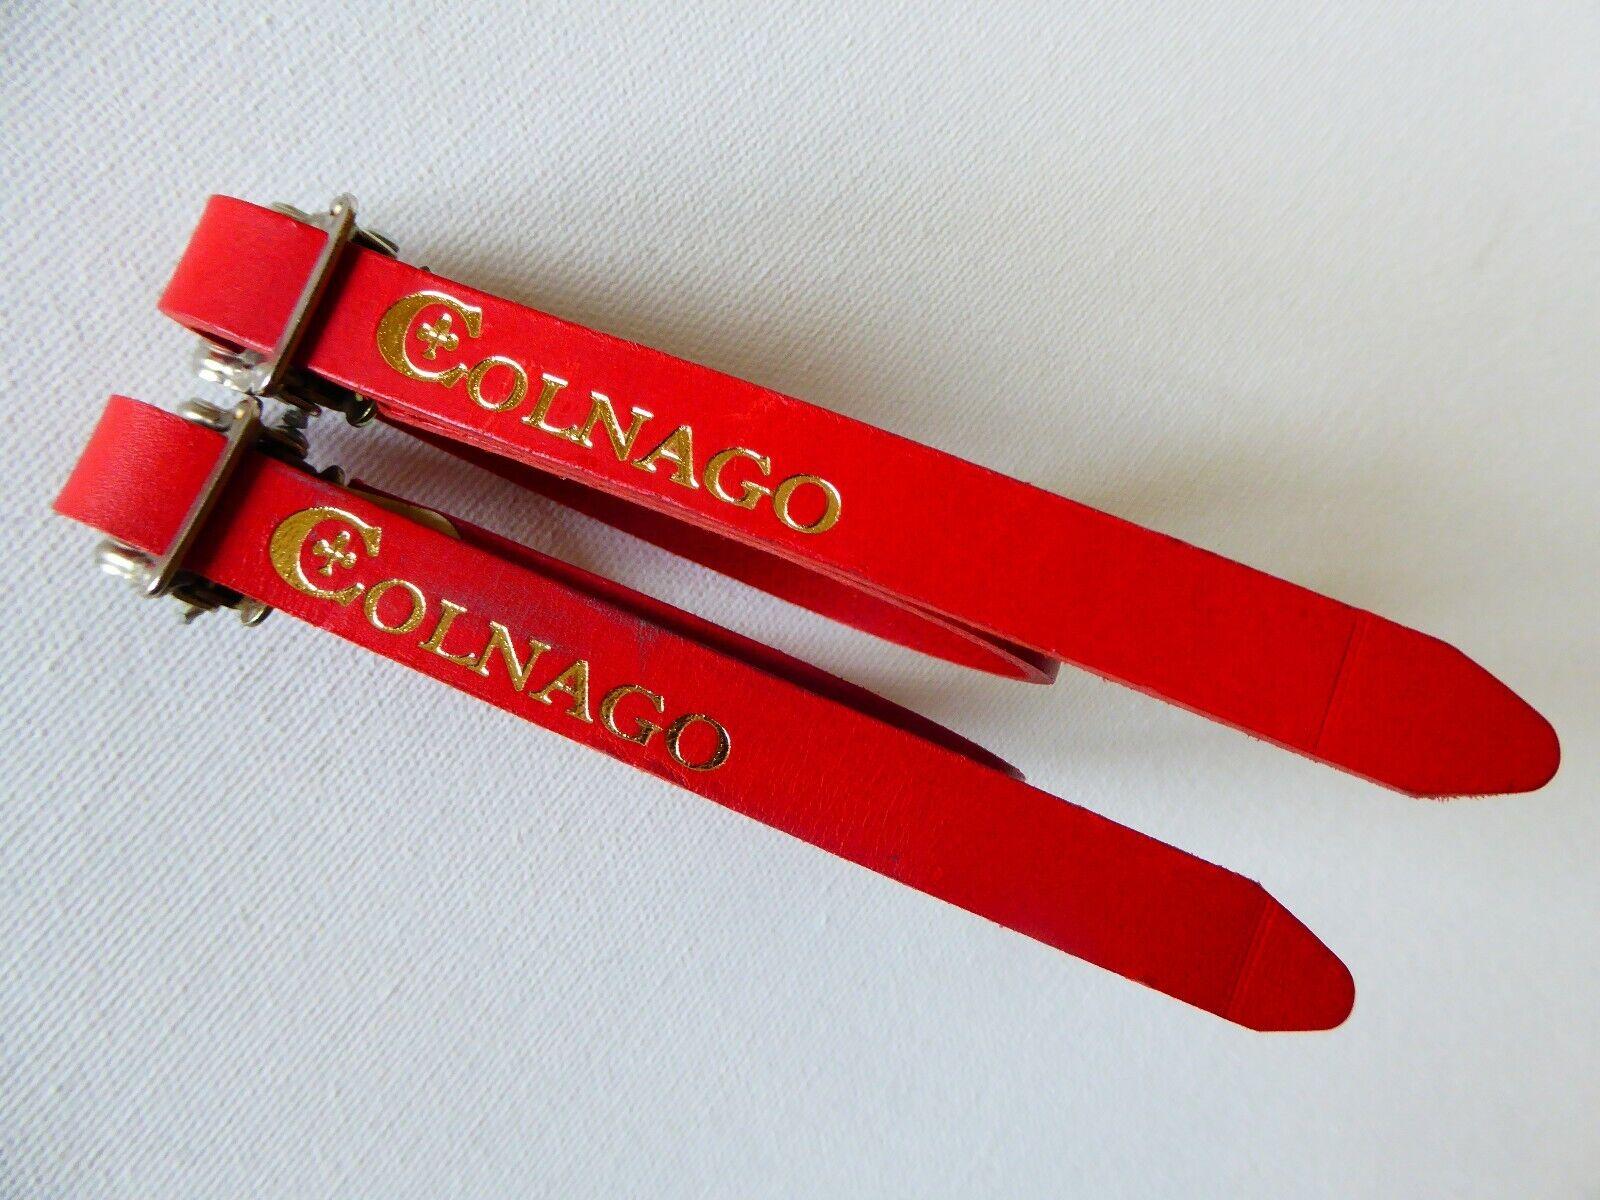 Vintage NOS  Colnago   Dino Bian   RED Leather Toe Straps your Vintage Ride  big savings